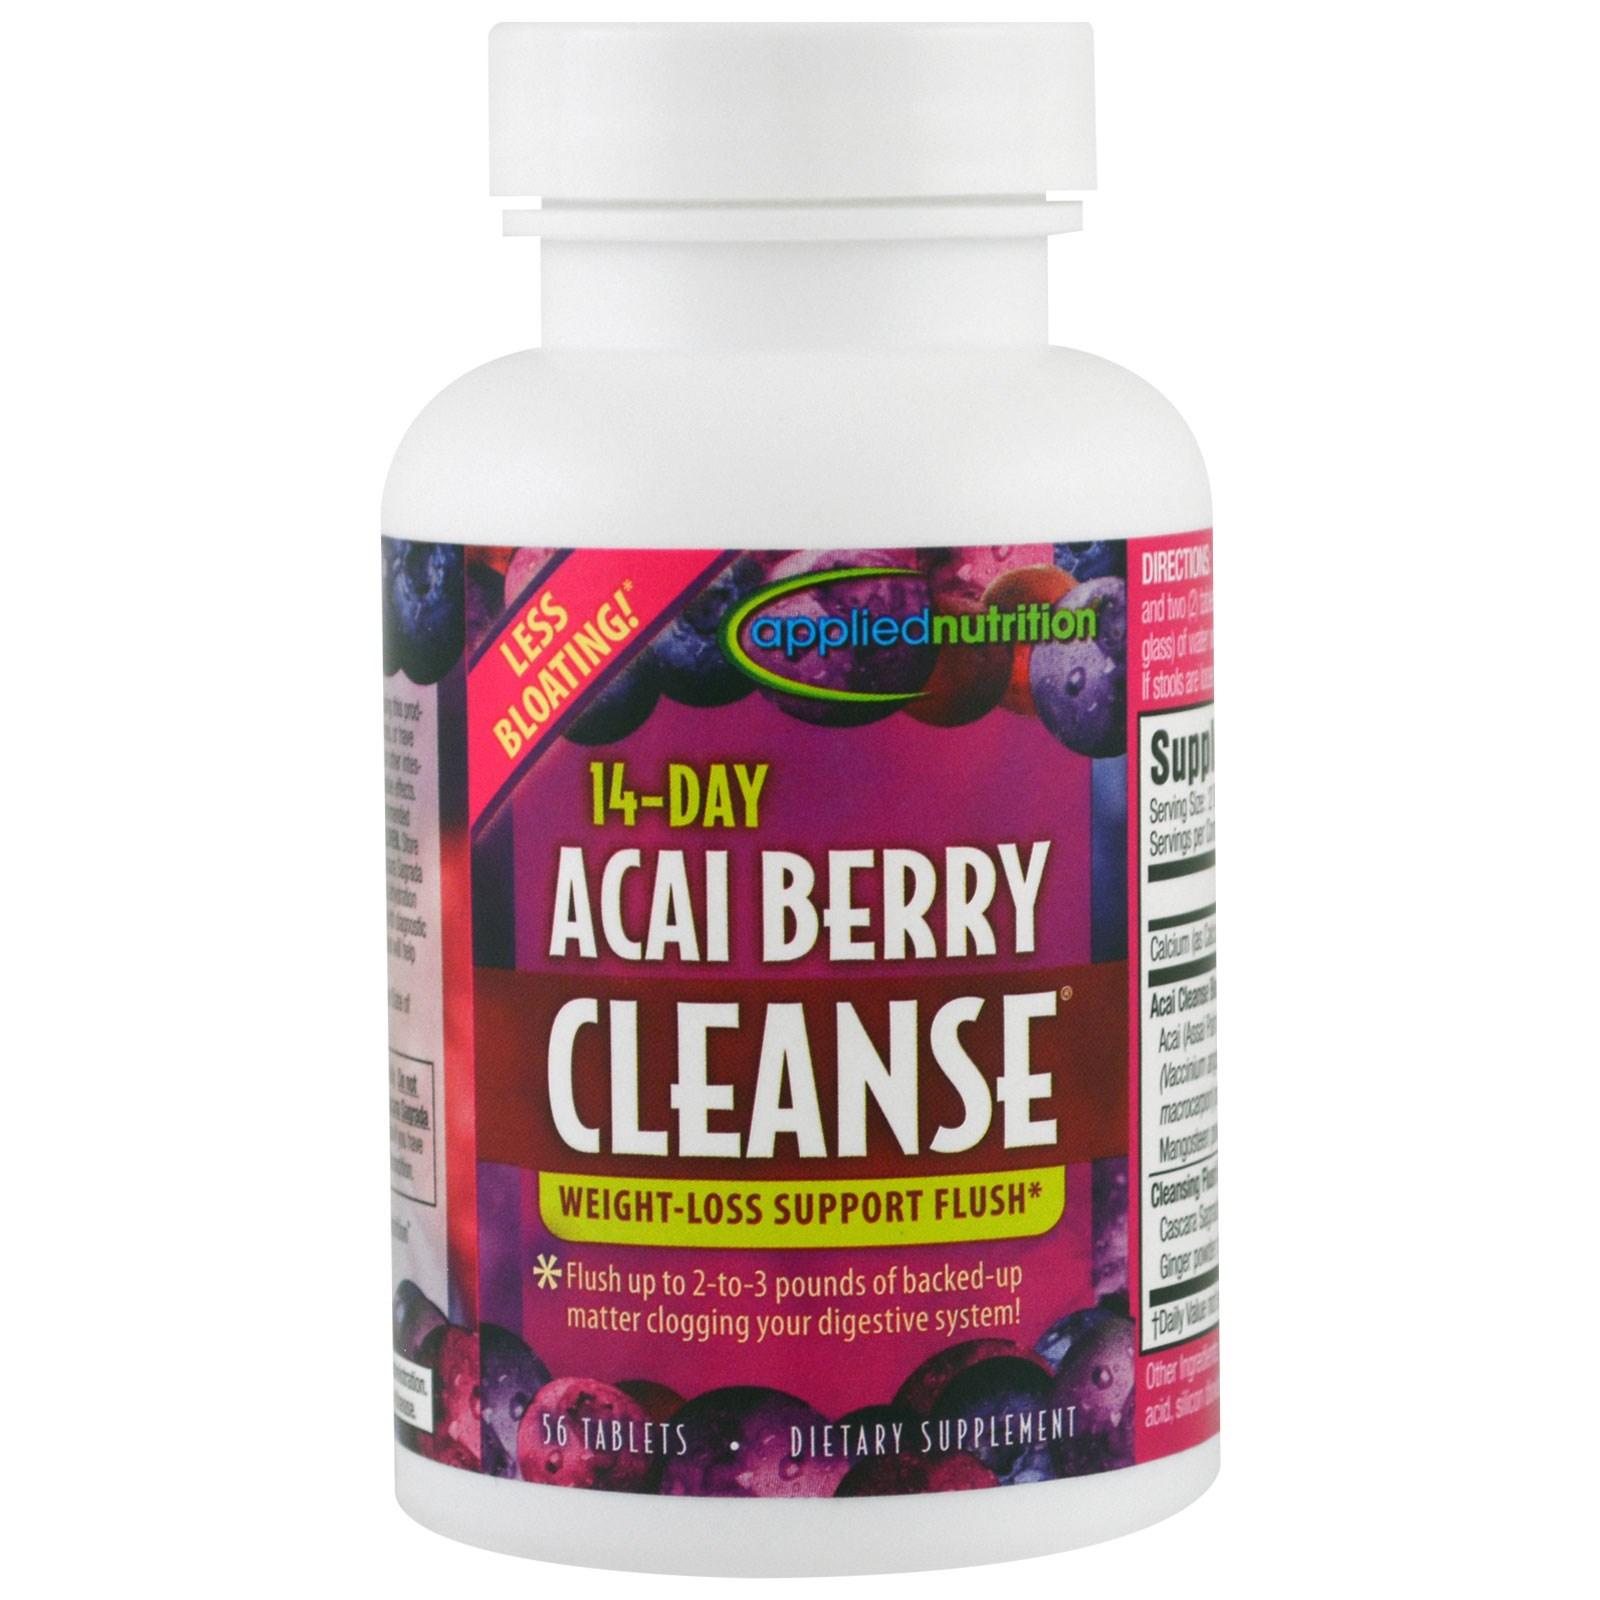 Acai berry detox pills